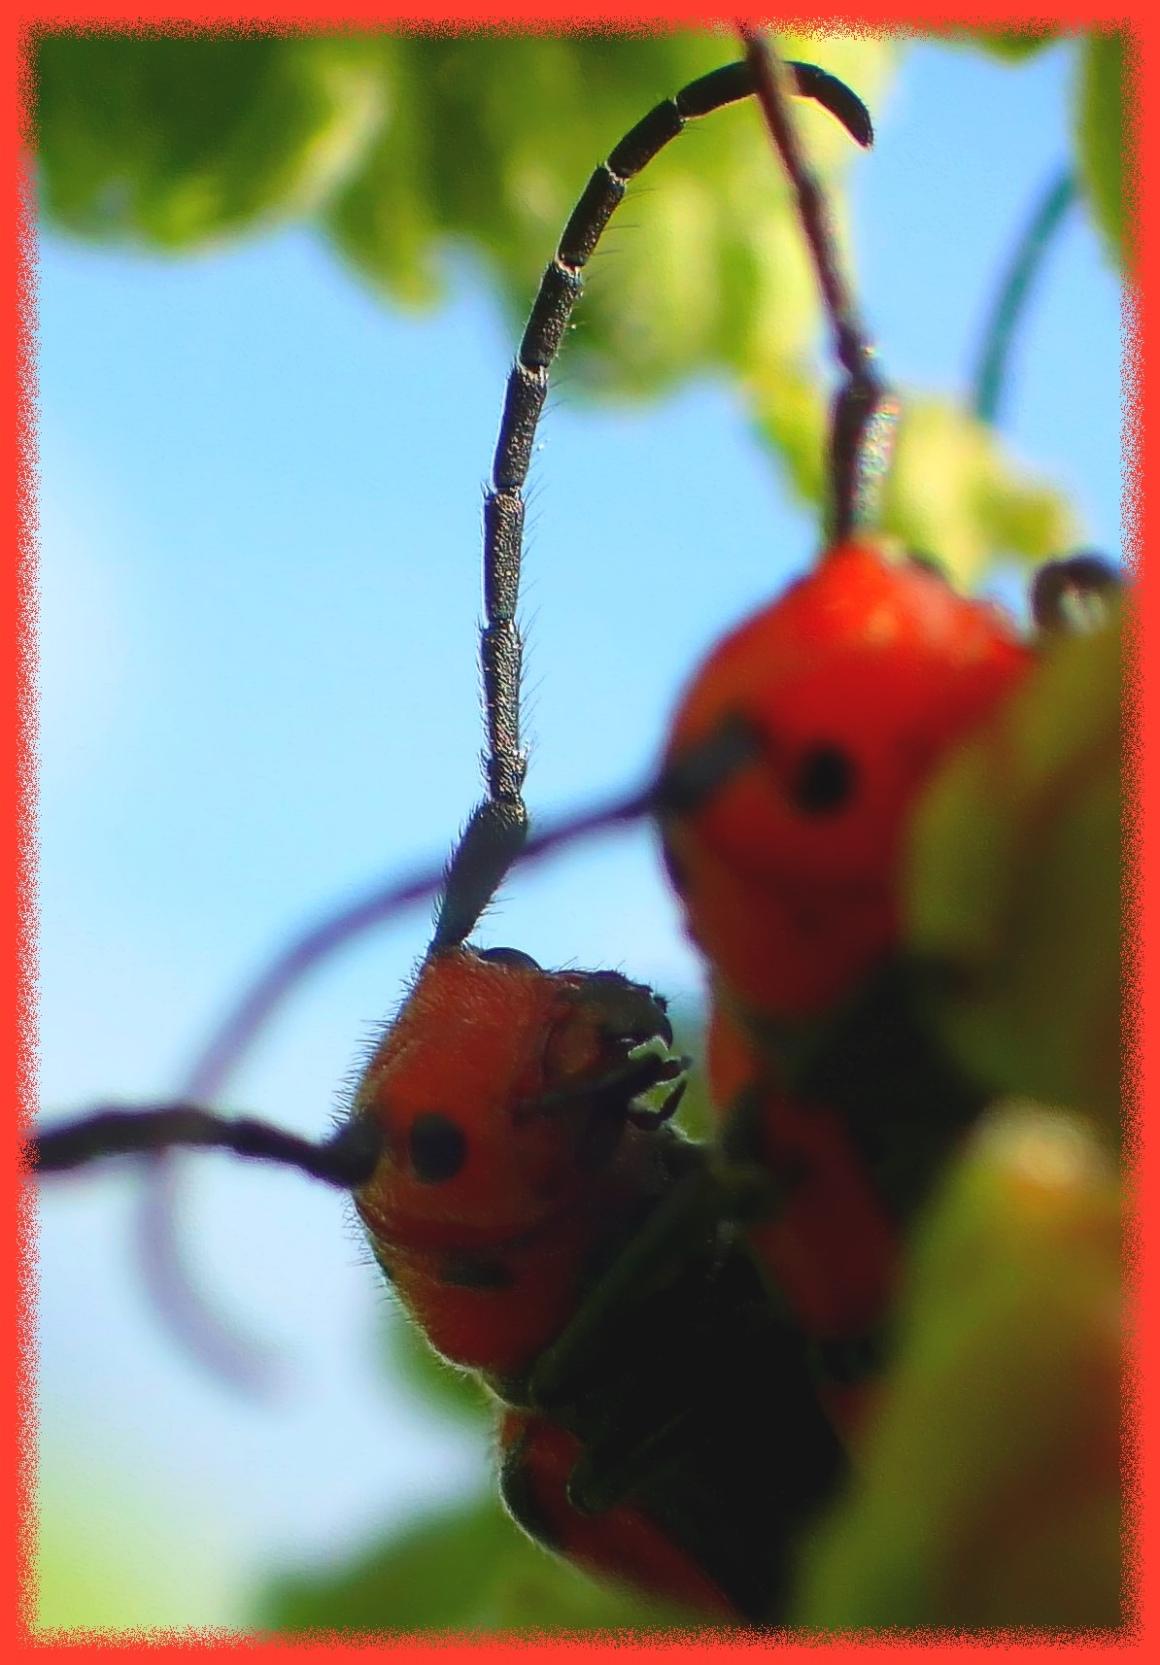 Red Milkweed Borer. (1) Photo by Thomas Peace c. 2016